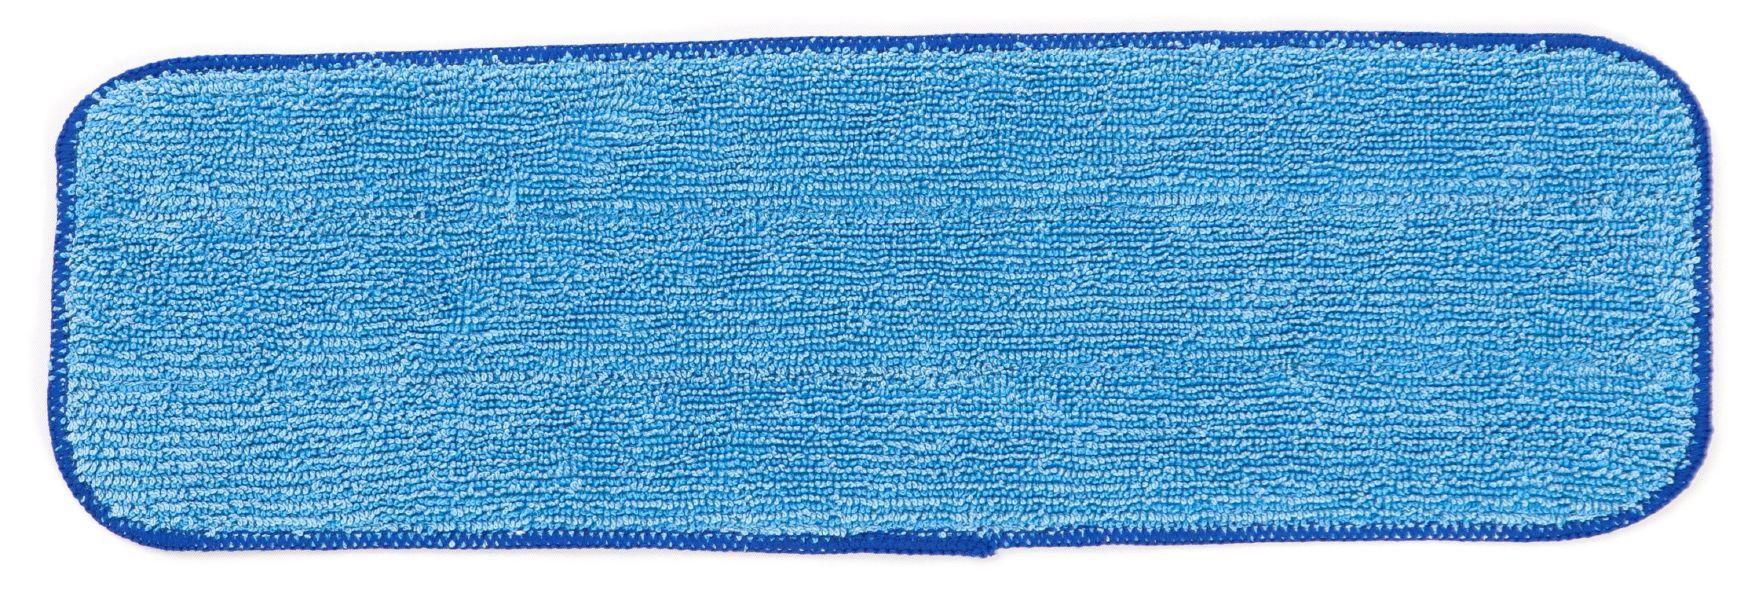 RECAMBIO MOPA DE MICROFIBRA M101 AZUL